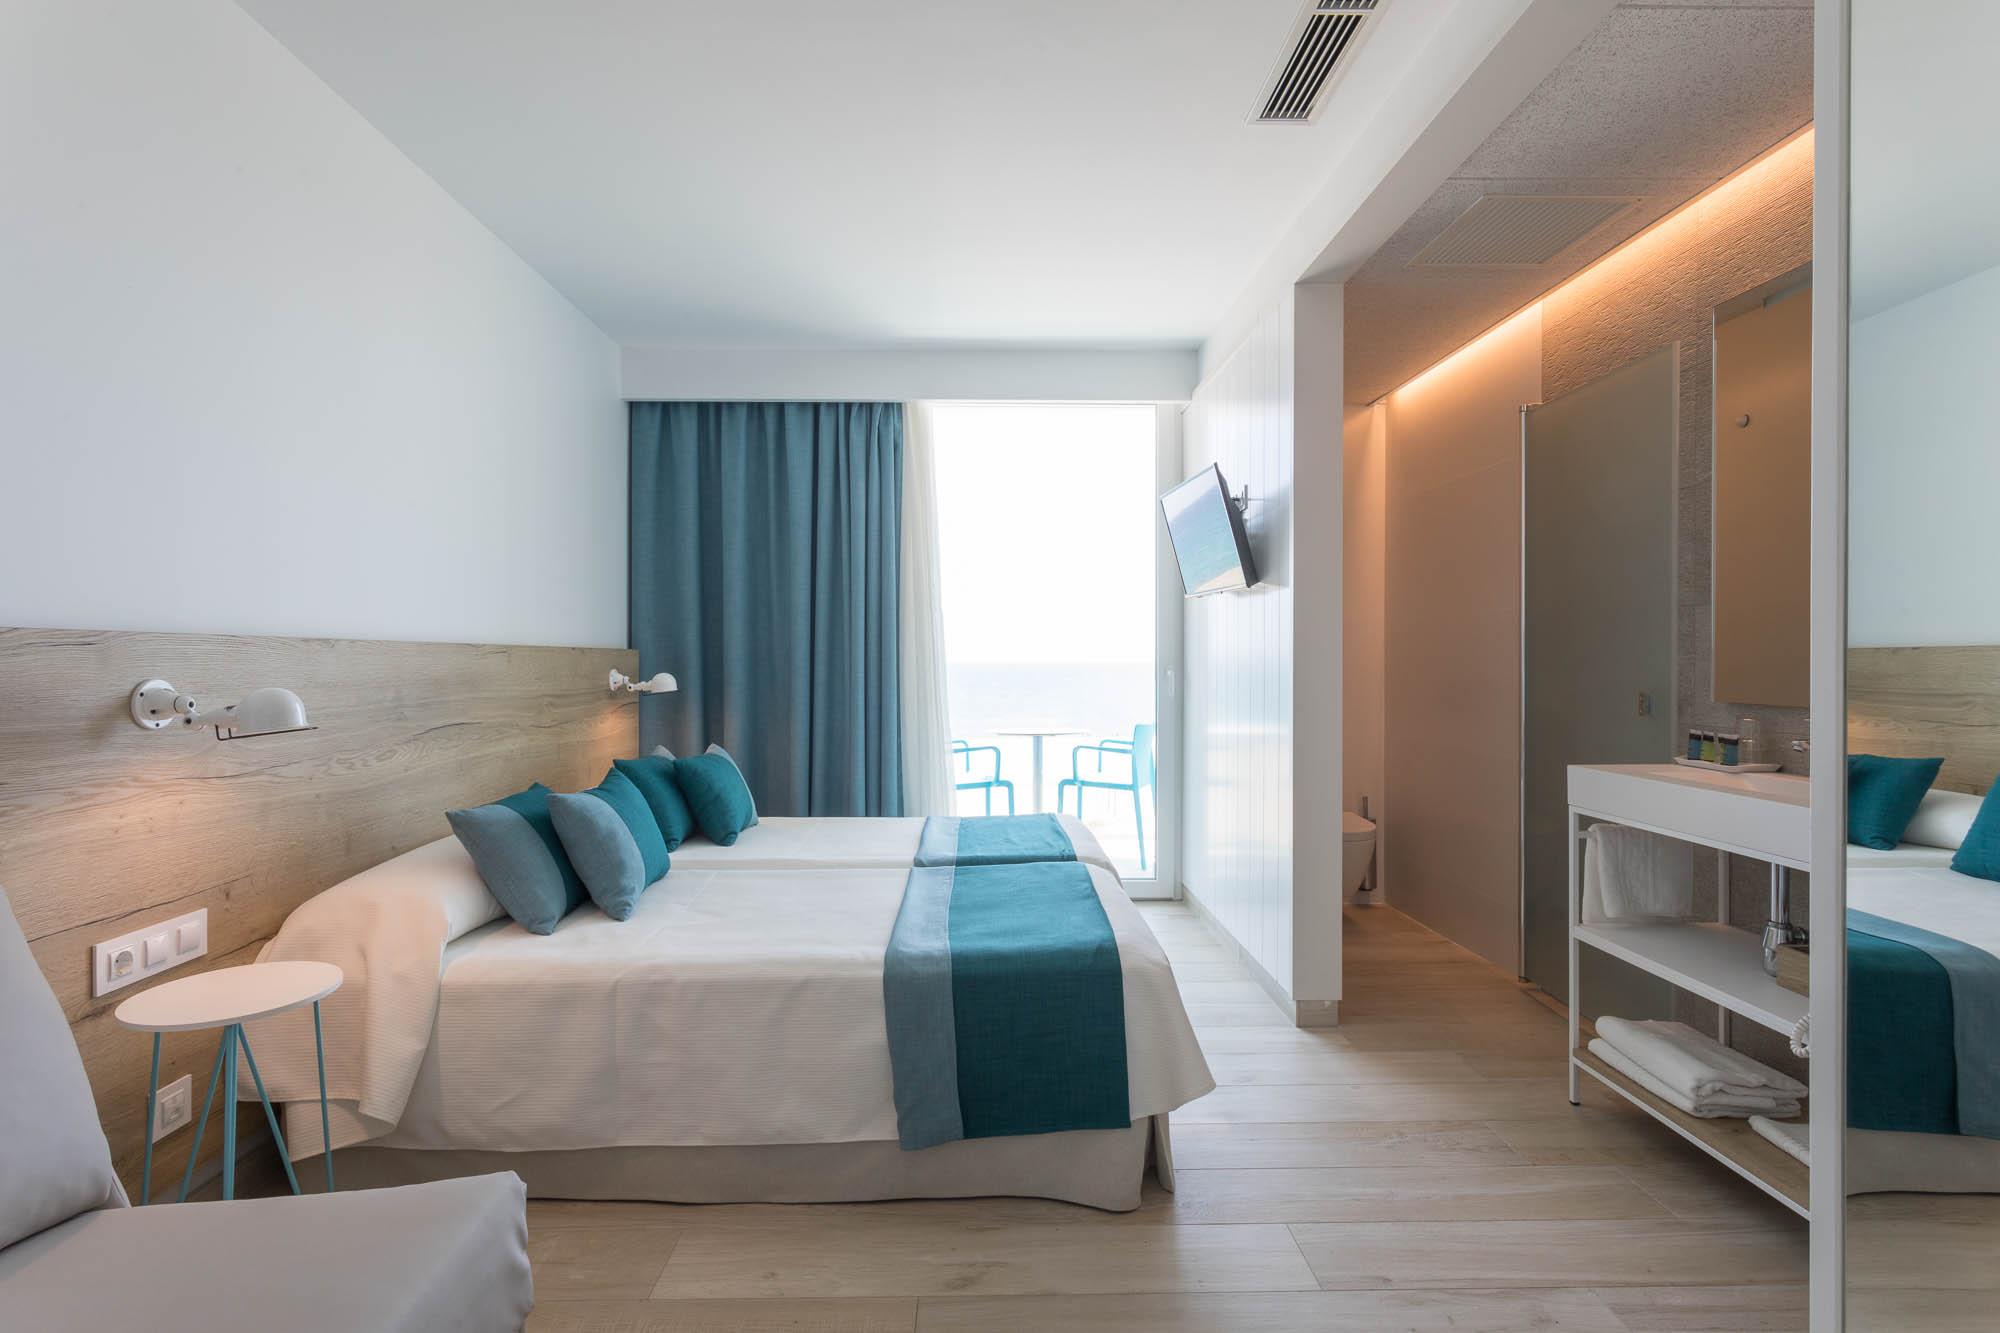 ESTILUZ - ROSA COLET Detalle Lampara HOTEL ROCATEL